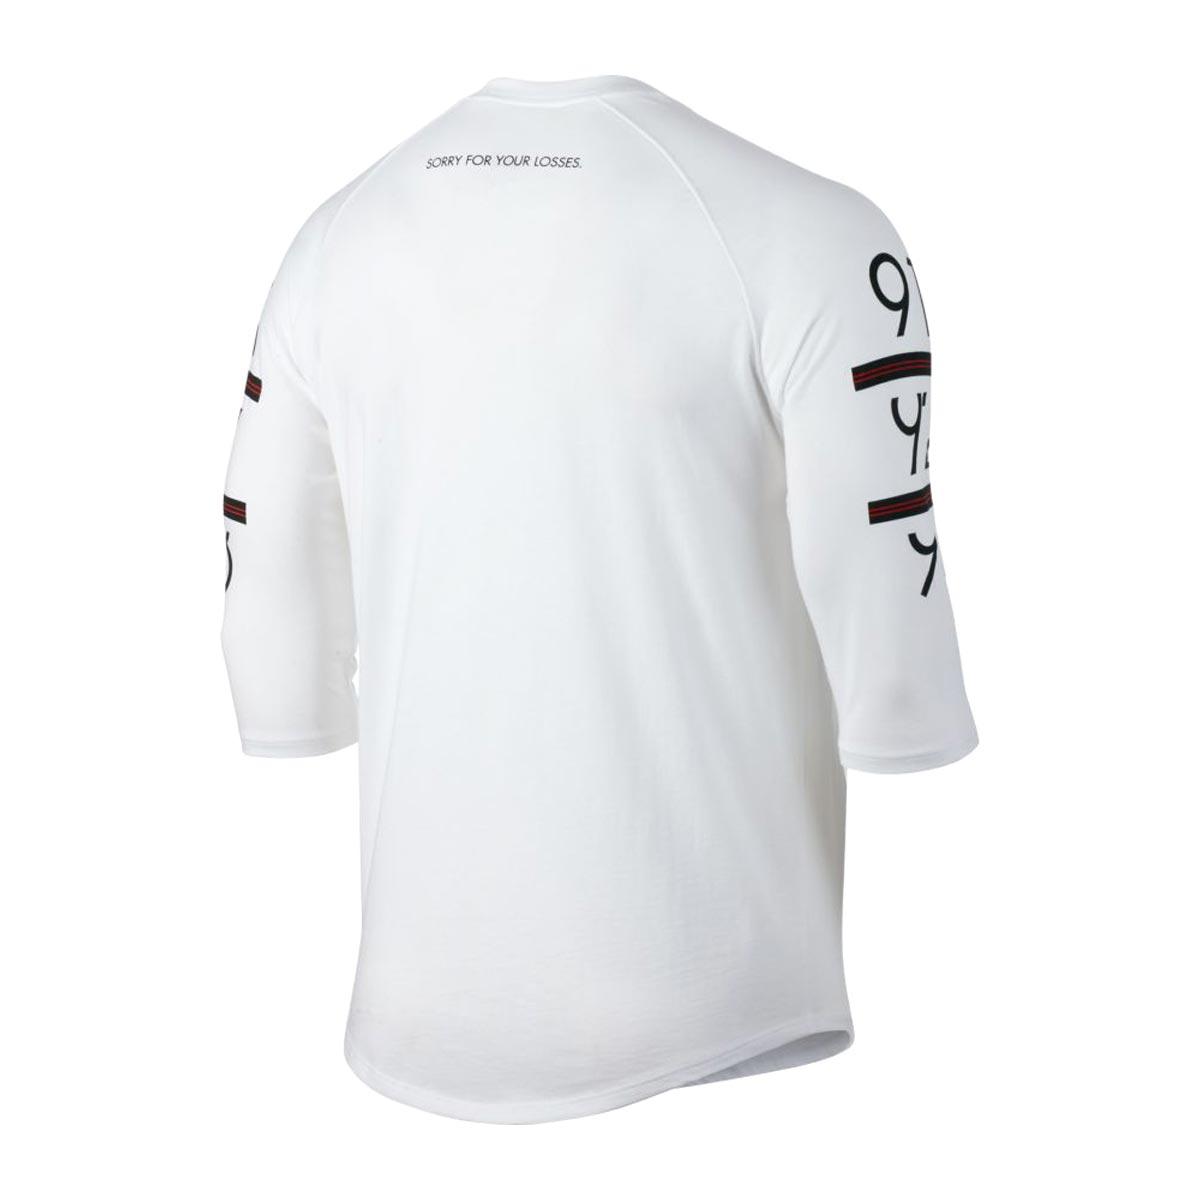 NIKE 6 TIMES 3/4 RAGLAN (the Jordan 6 TIMES 3/4 raglan sleeves top) WHITE/BLACK 17FA-I